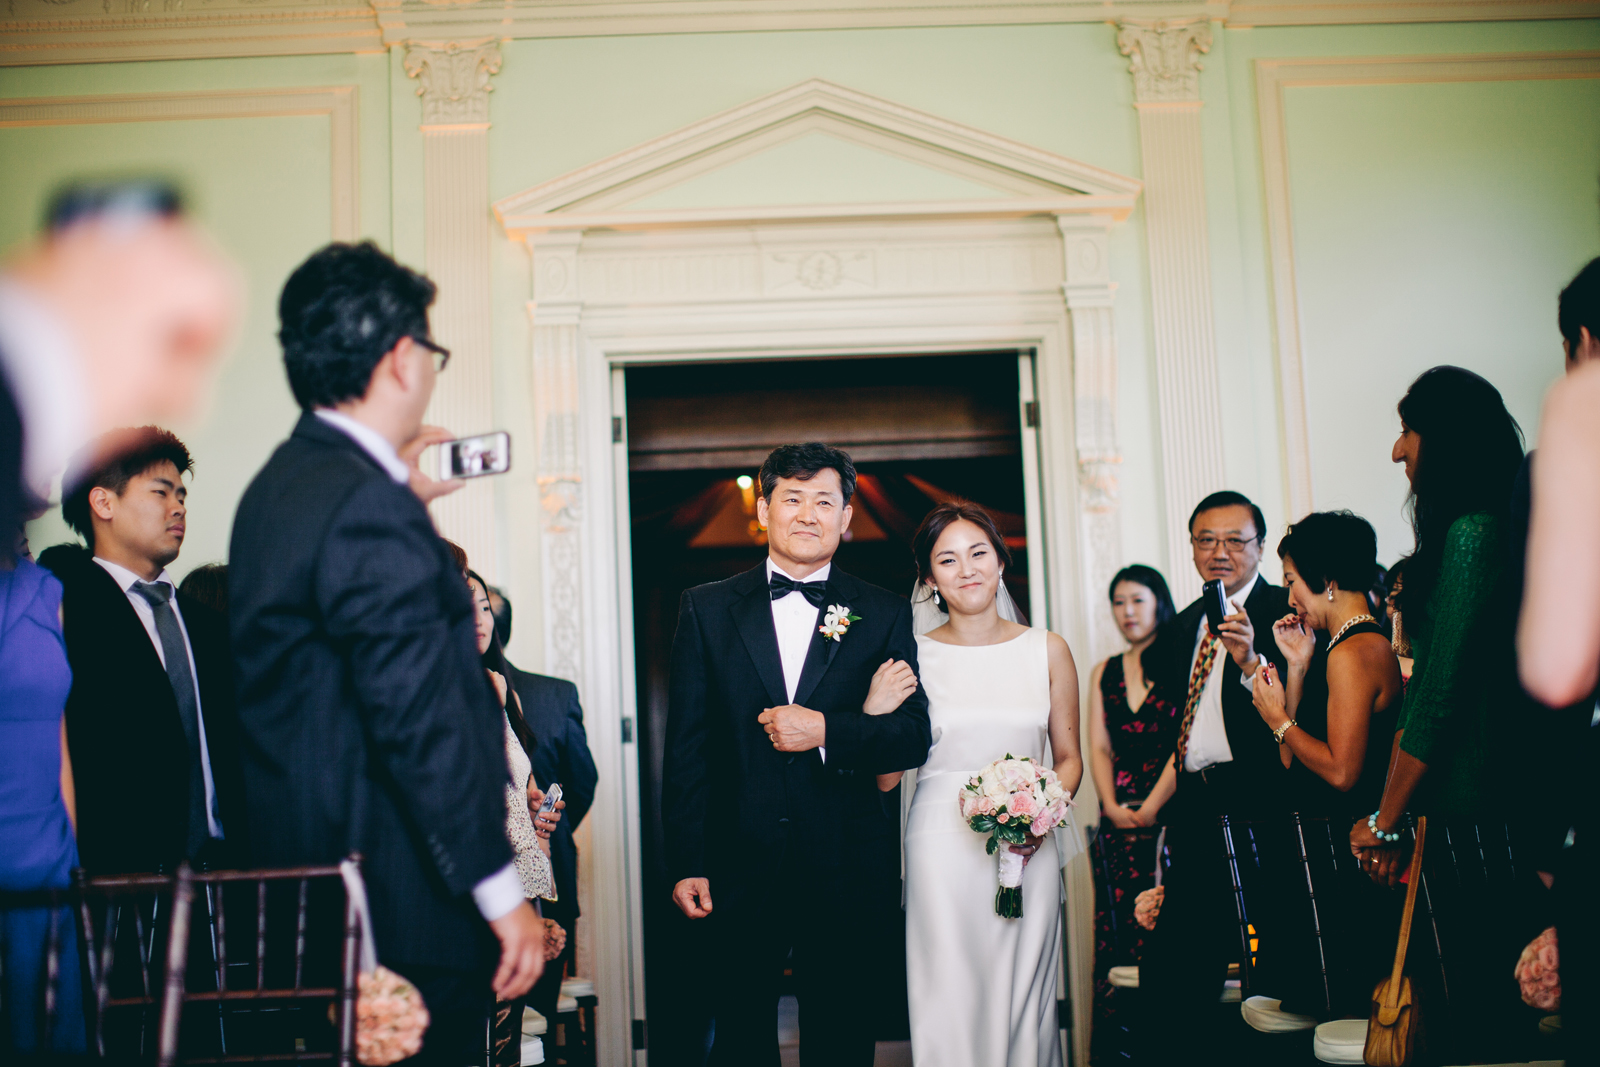 kohl_manison_wedding_photography_sarah_eric_ebony_siovhan_bokeh_photography_043.jpg